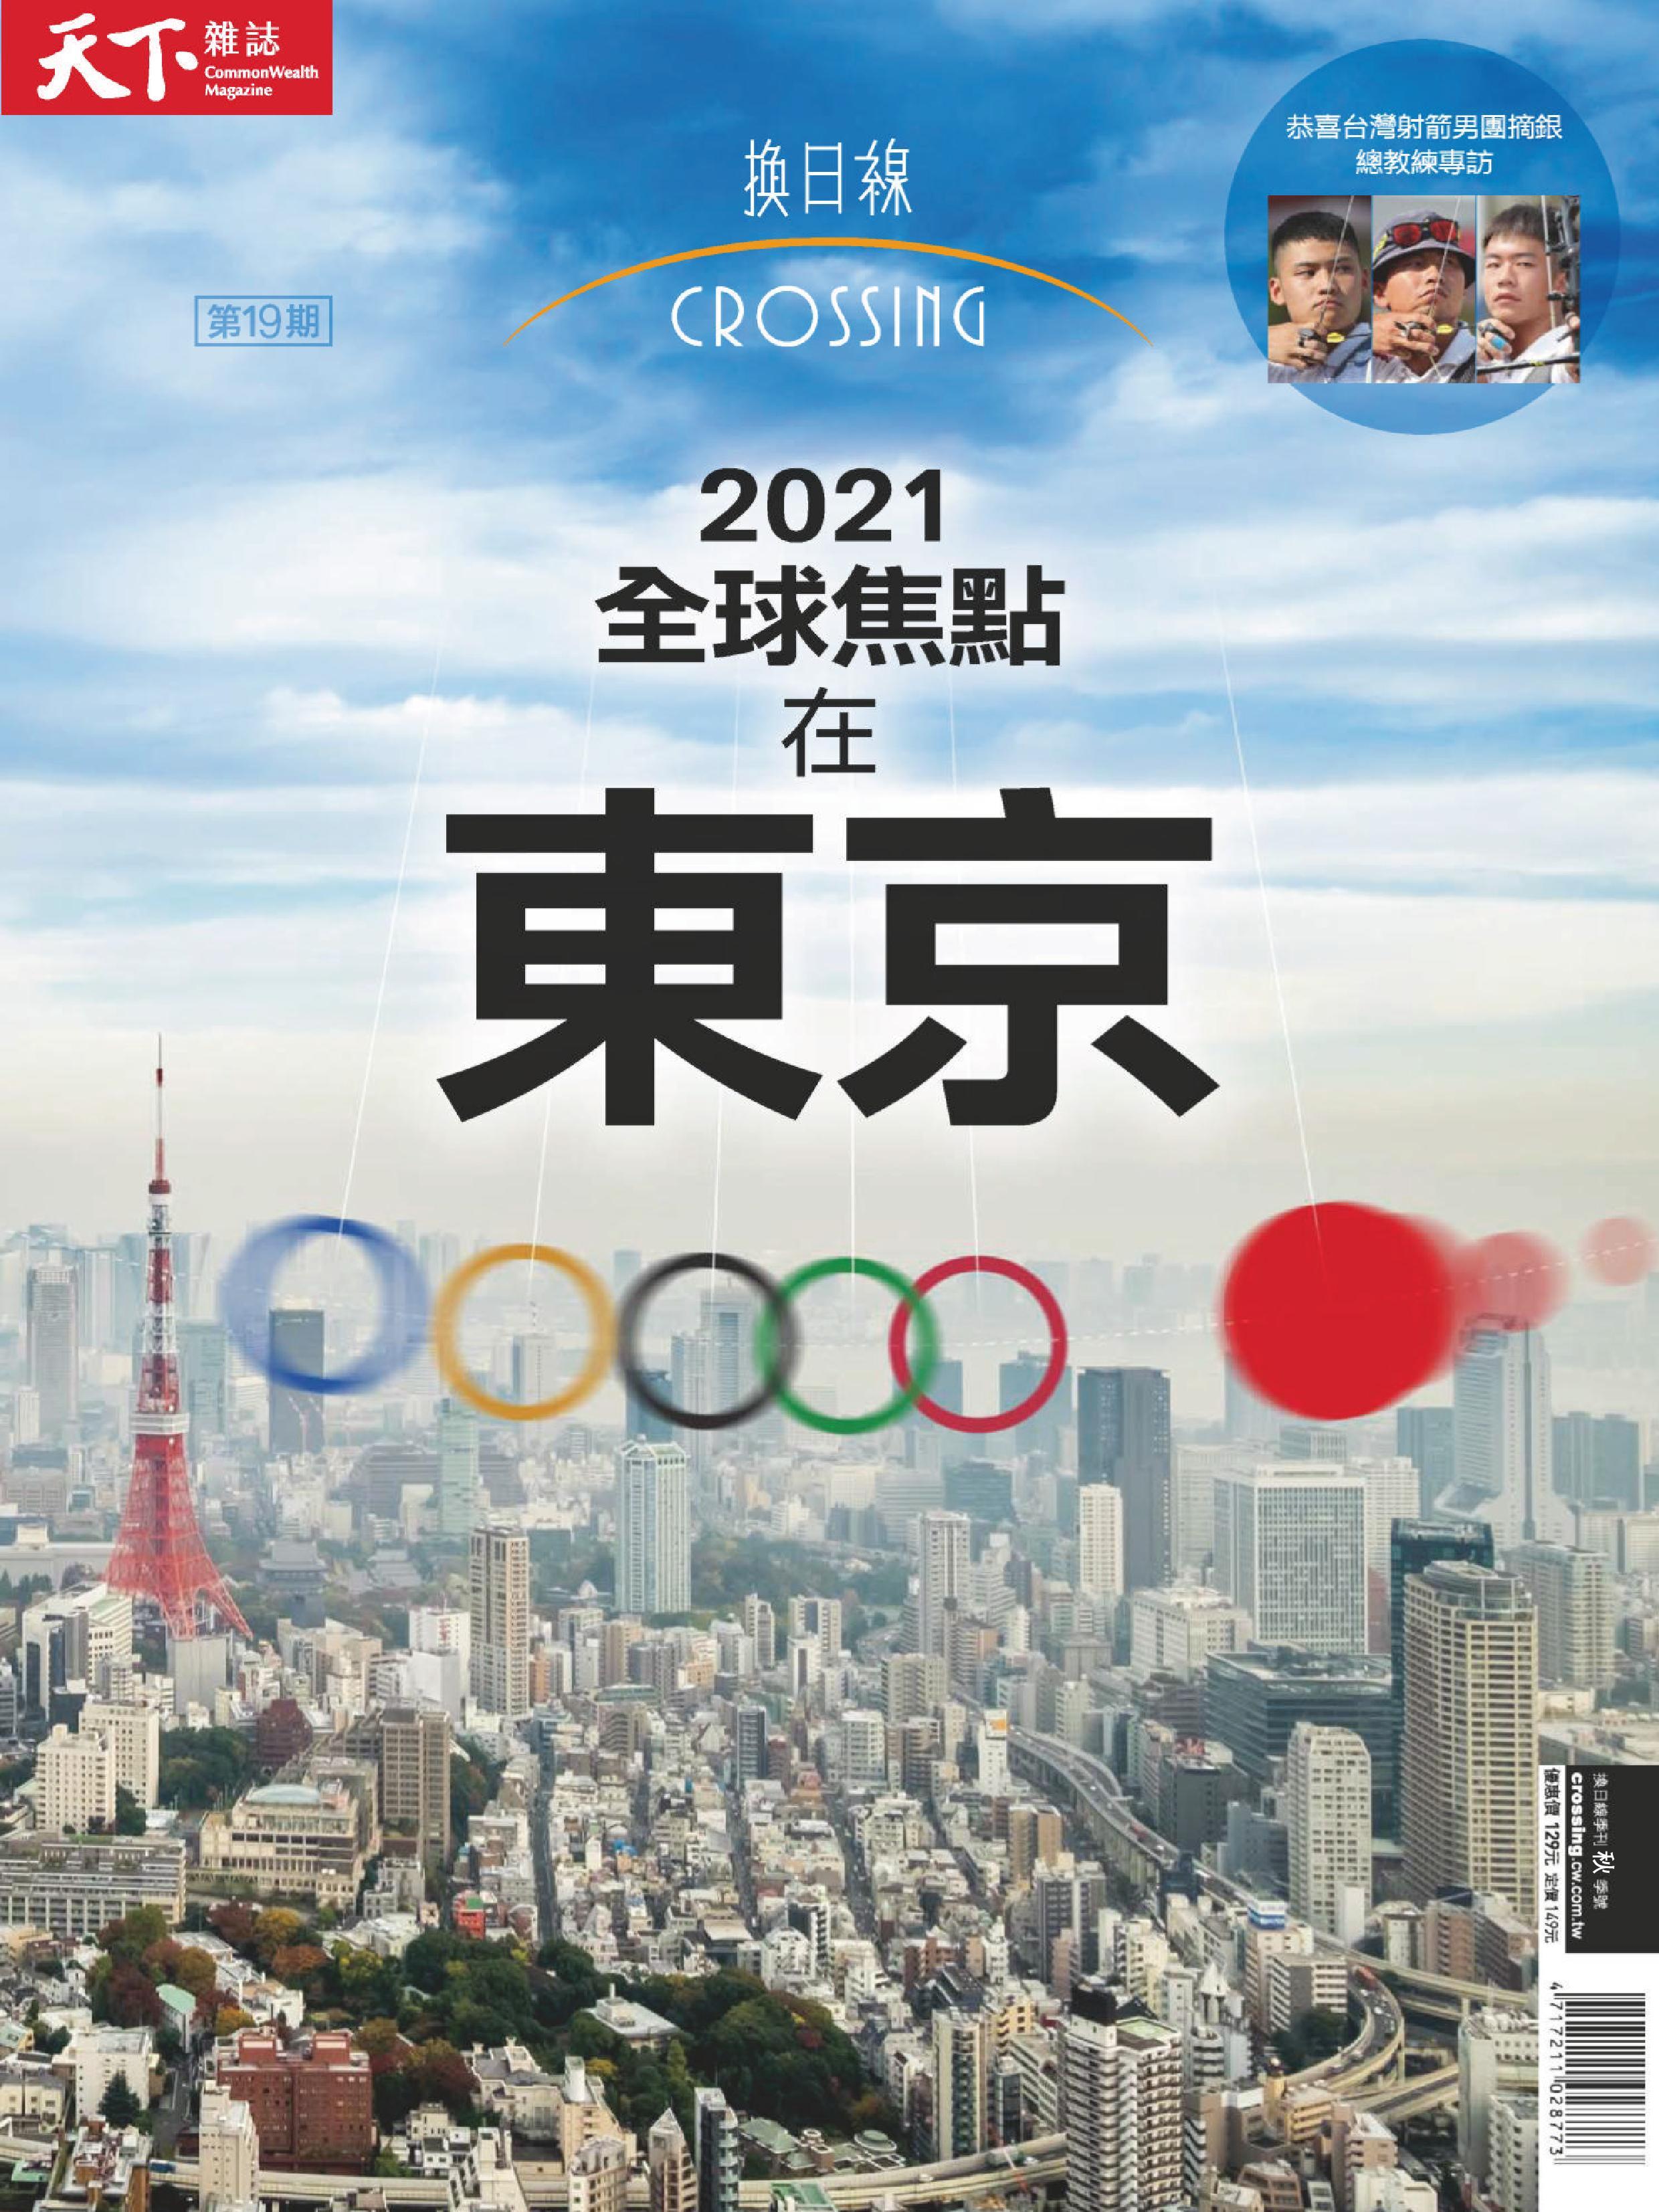 Crossing Quarterly 換日線季刊 - 八月 2021